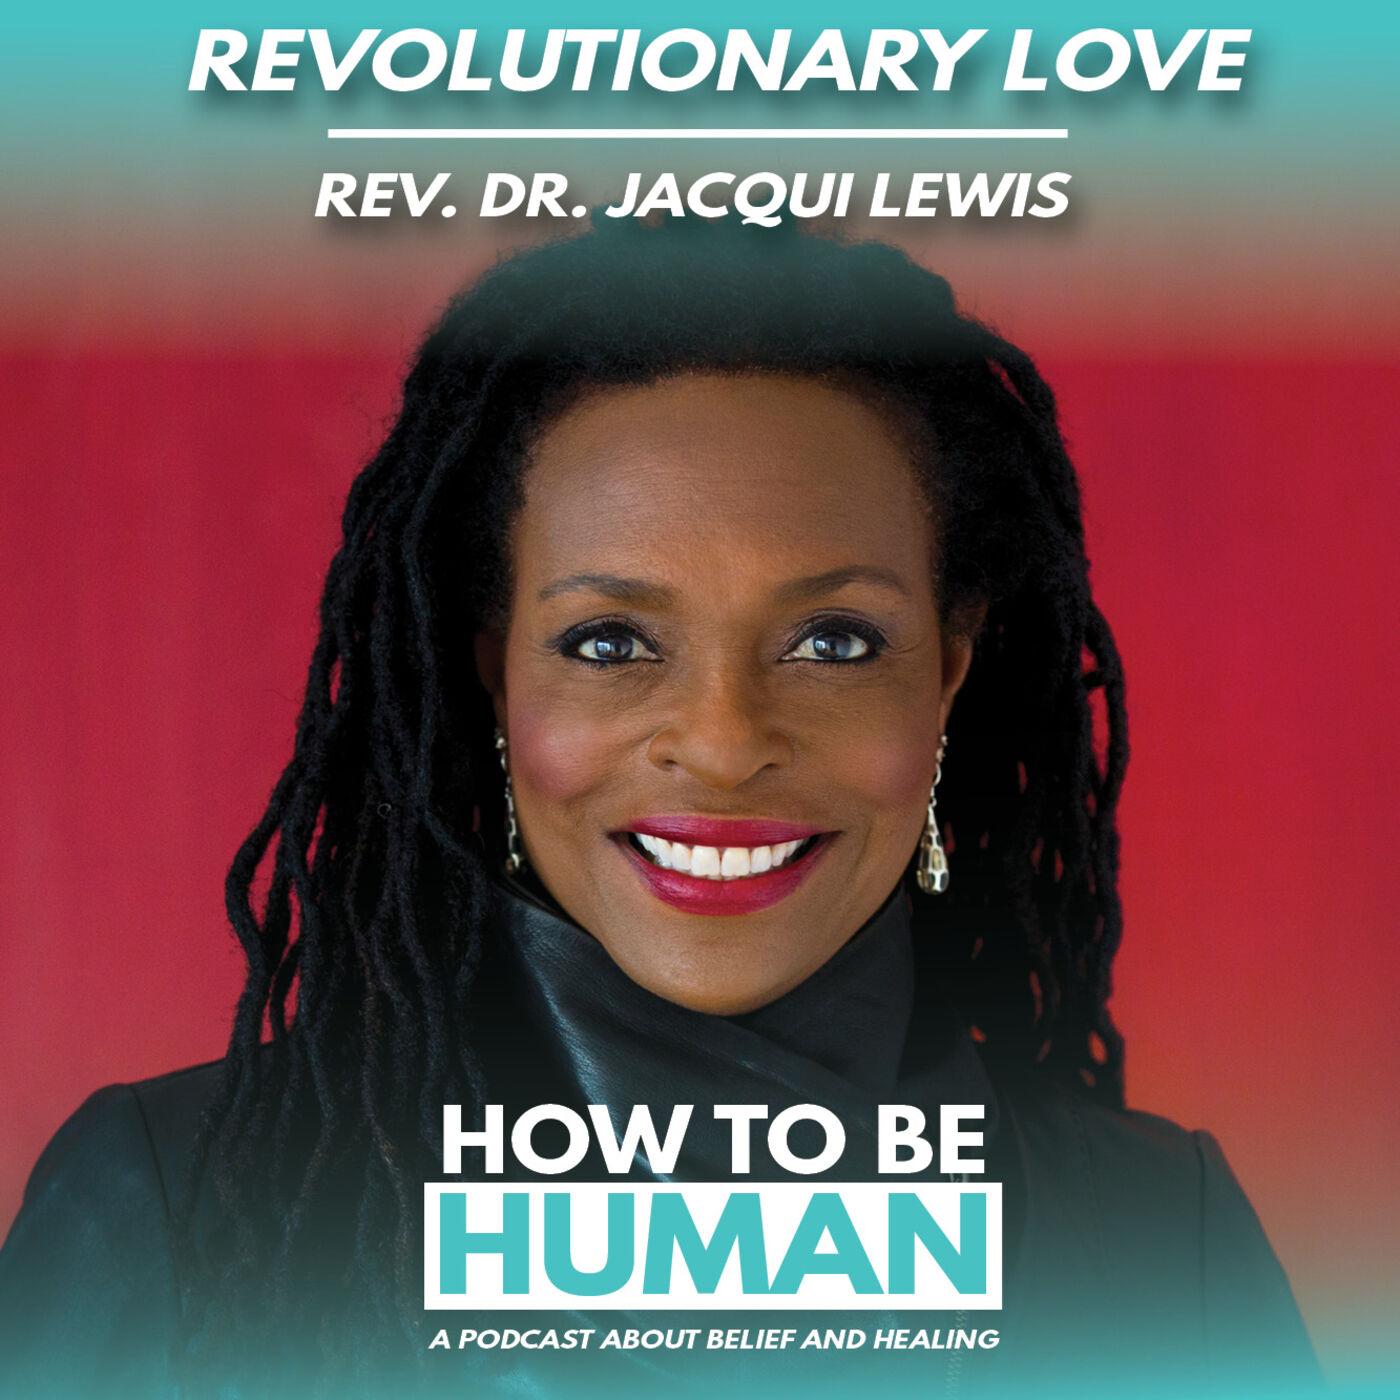 Revolutionary Love: Rev. Dr. Jacqui Lewis